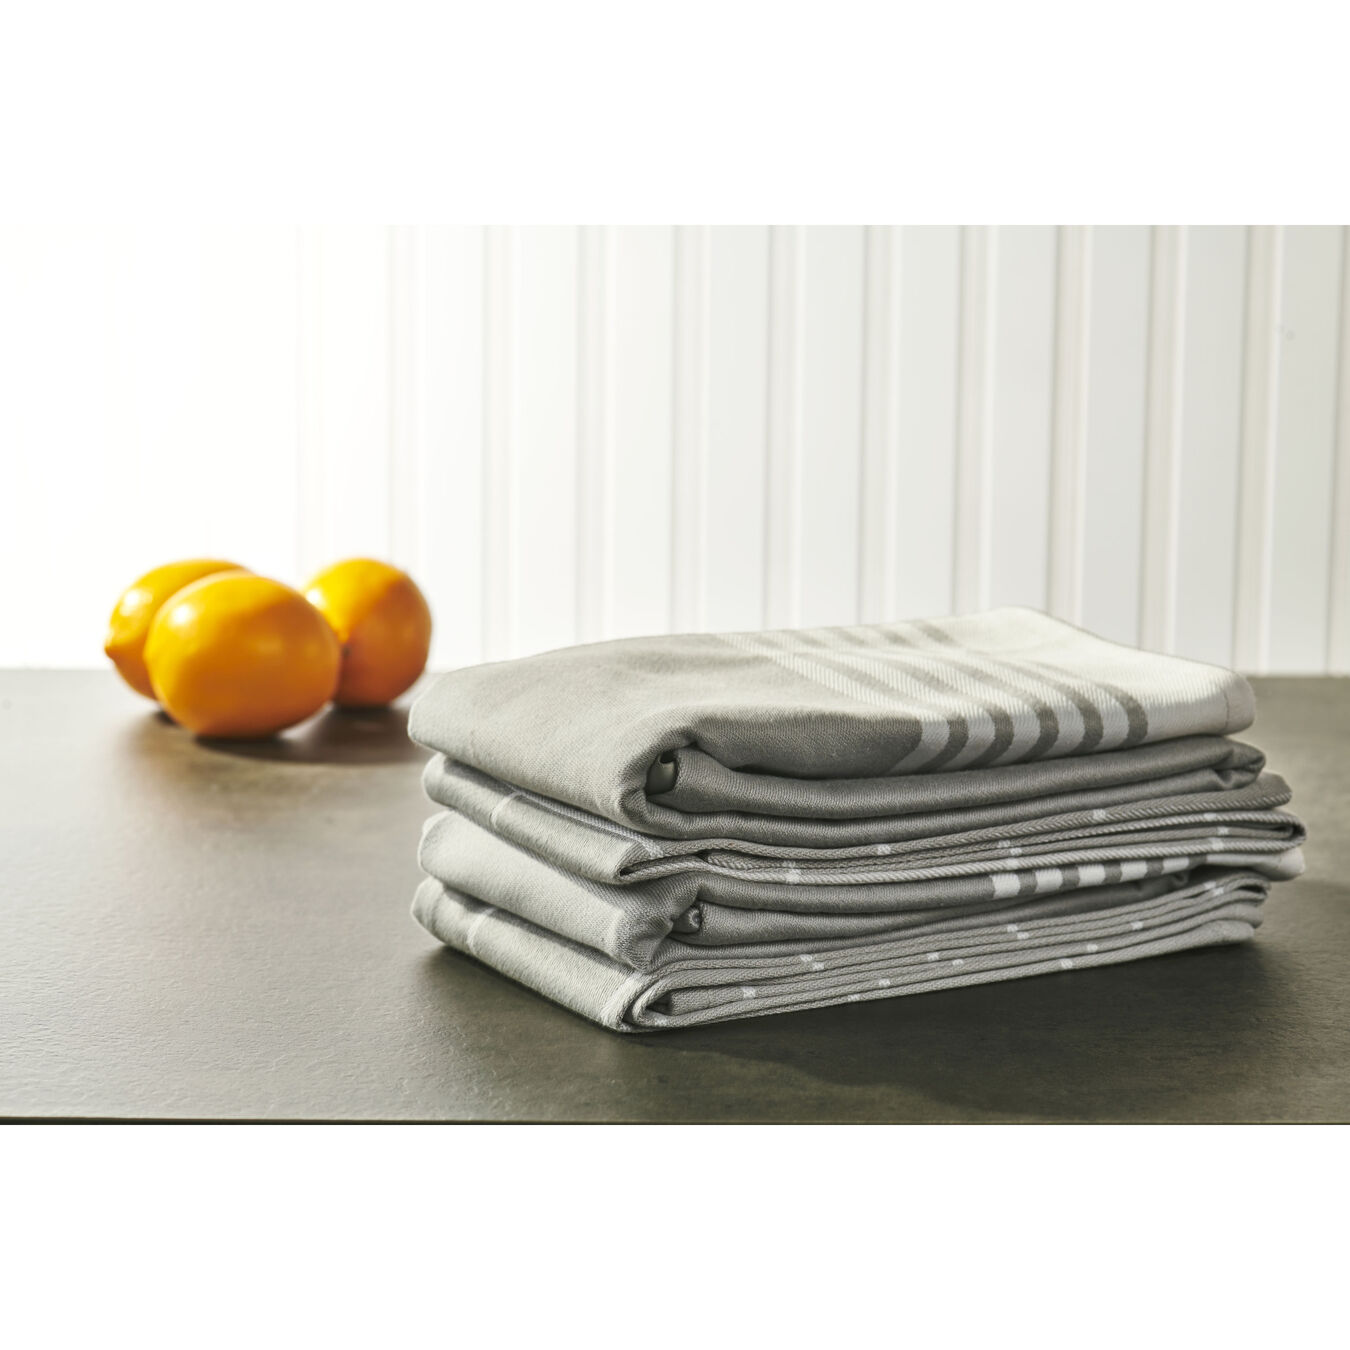 4-pc Kitchen Towel Set - Grey,,large 4